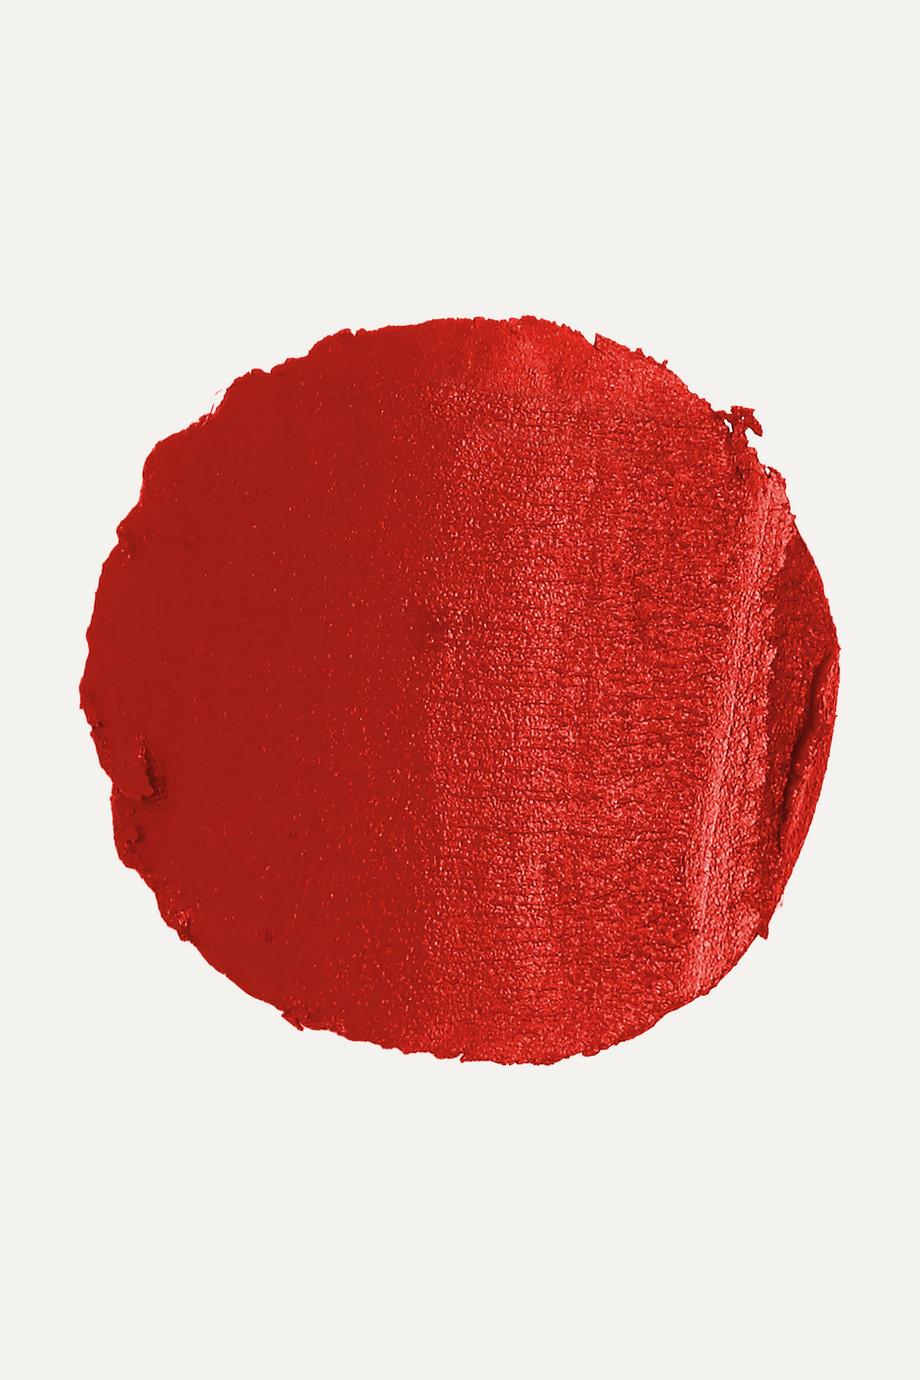 NARS Audacious Lipstick - Rita